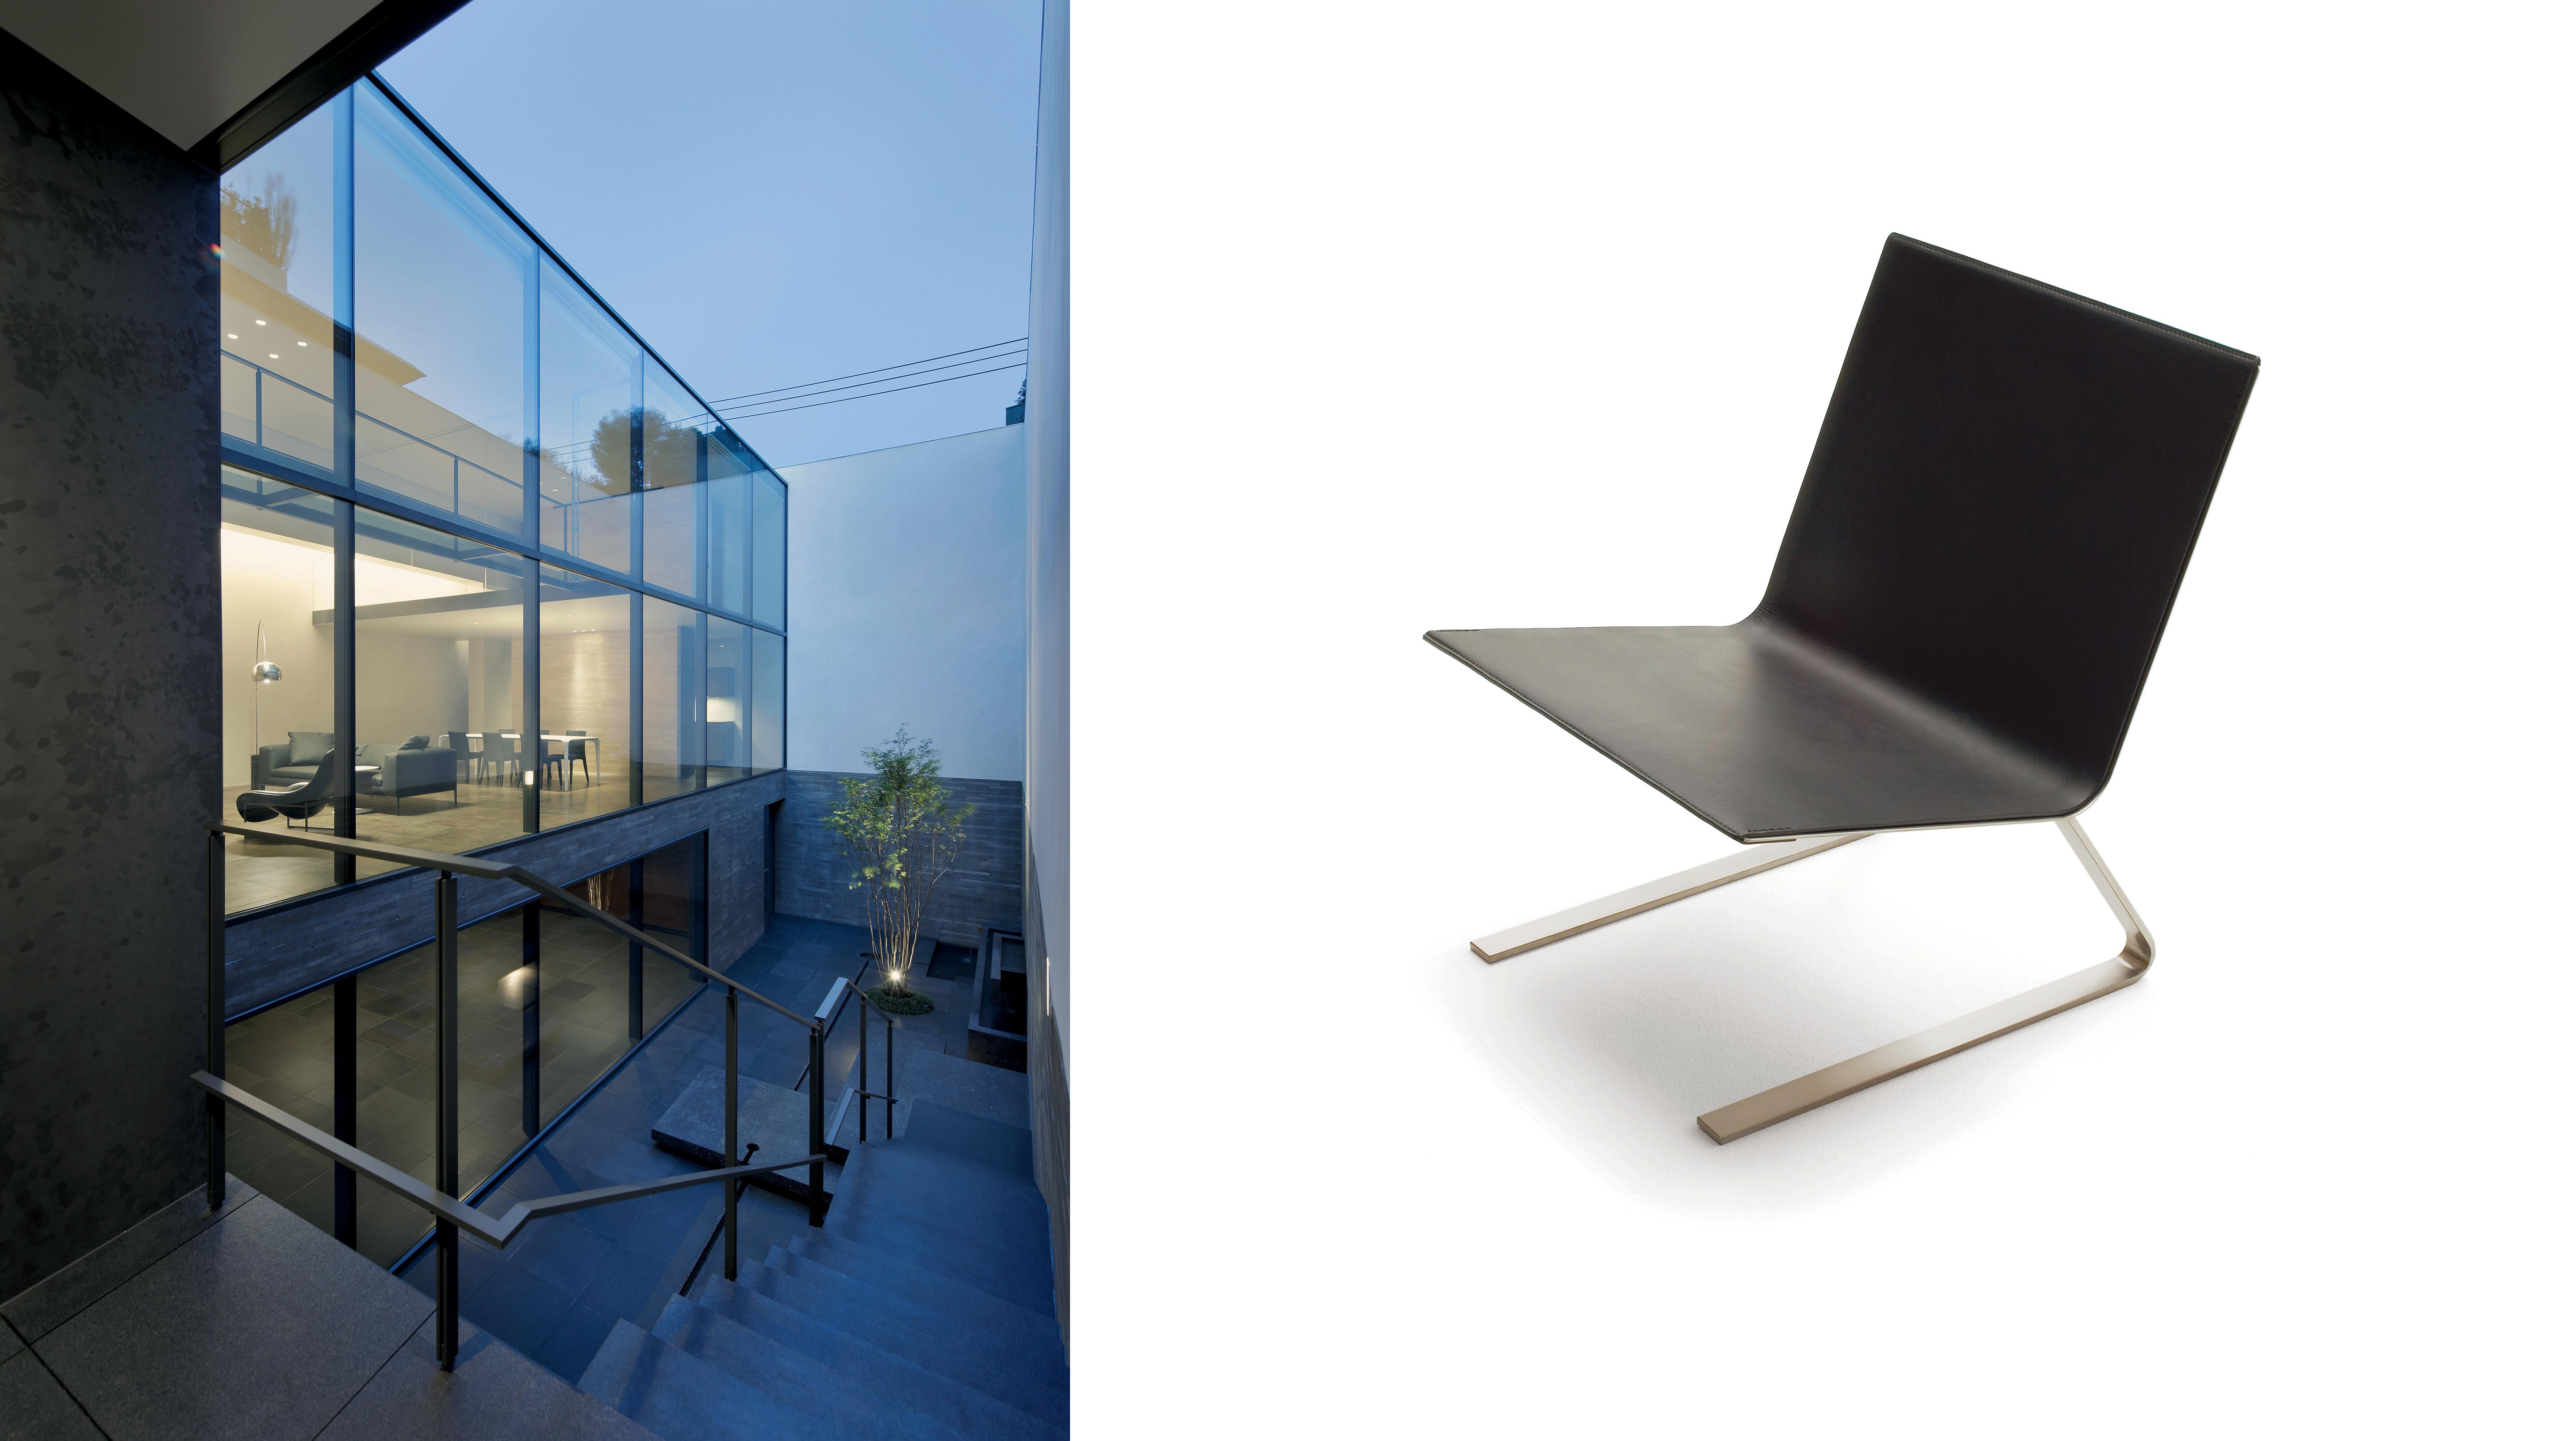 satoshi-okada-magazine-horse-chairs-and-architects